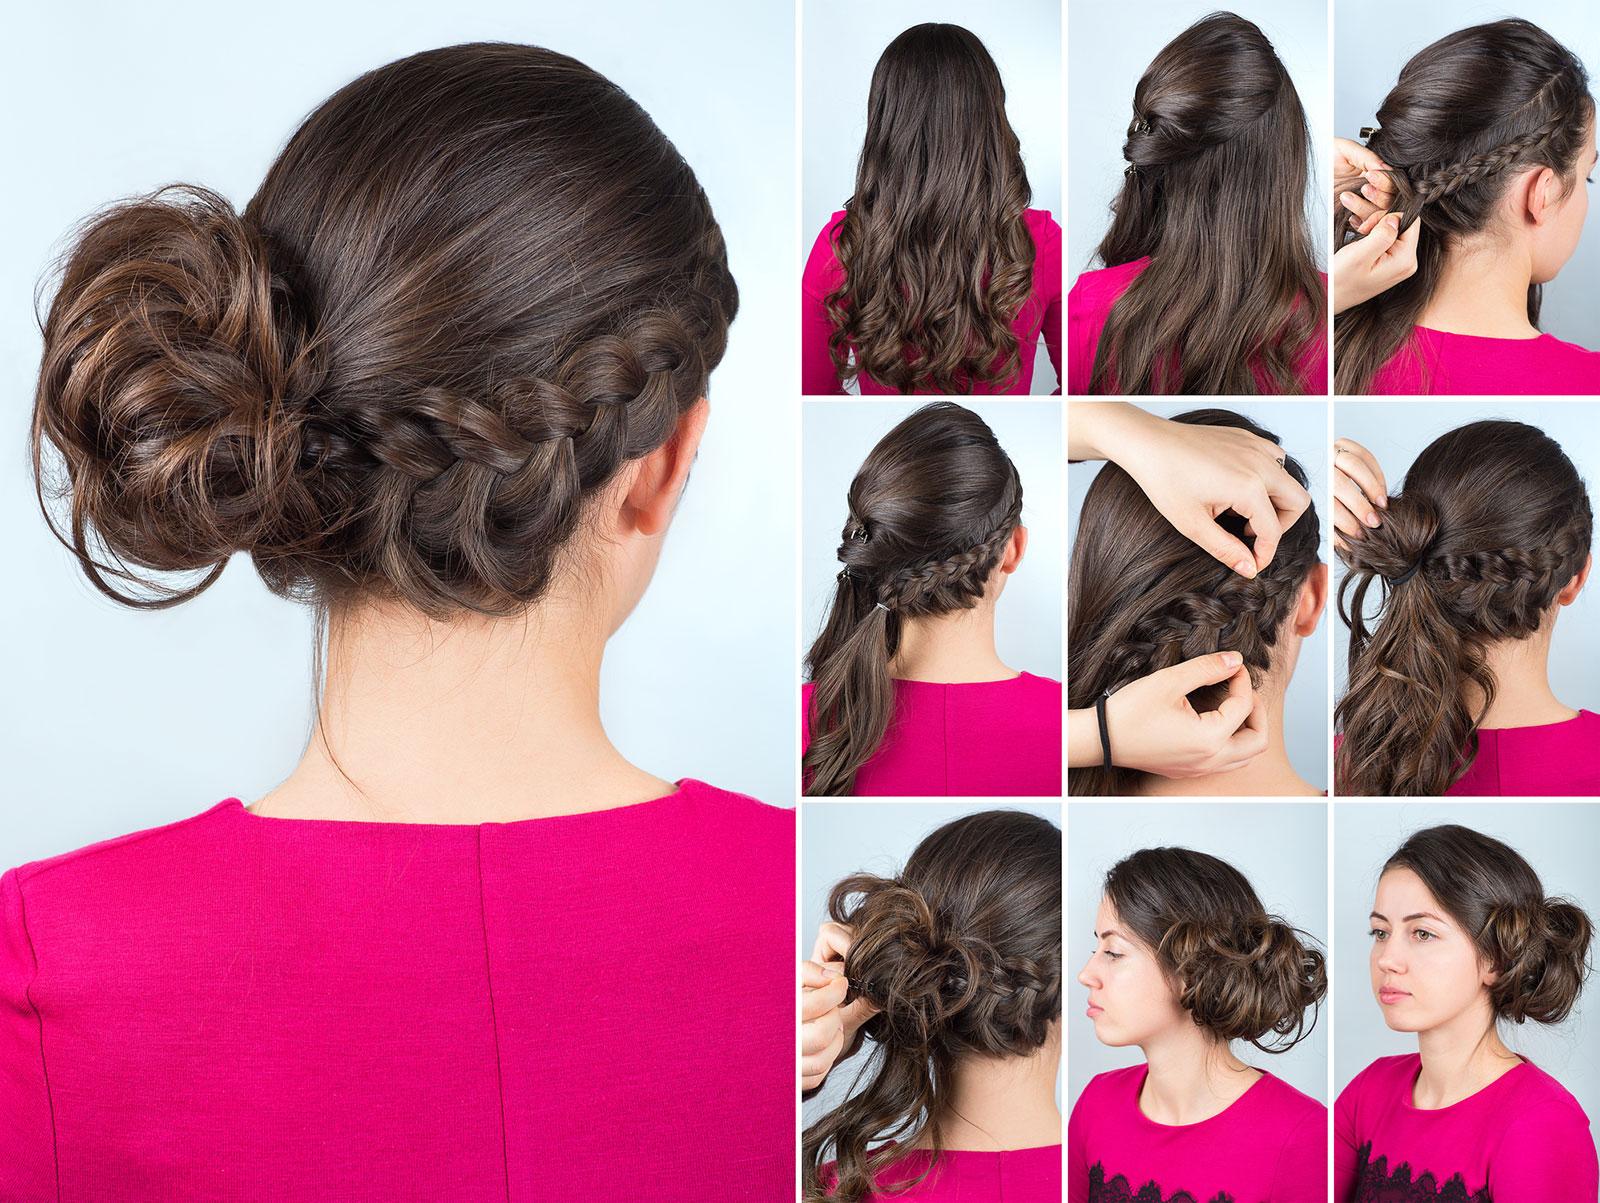 Braided side bun updo for long hair